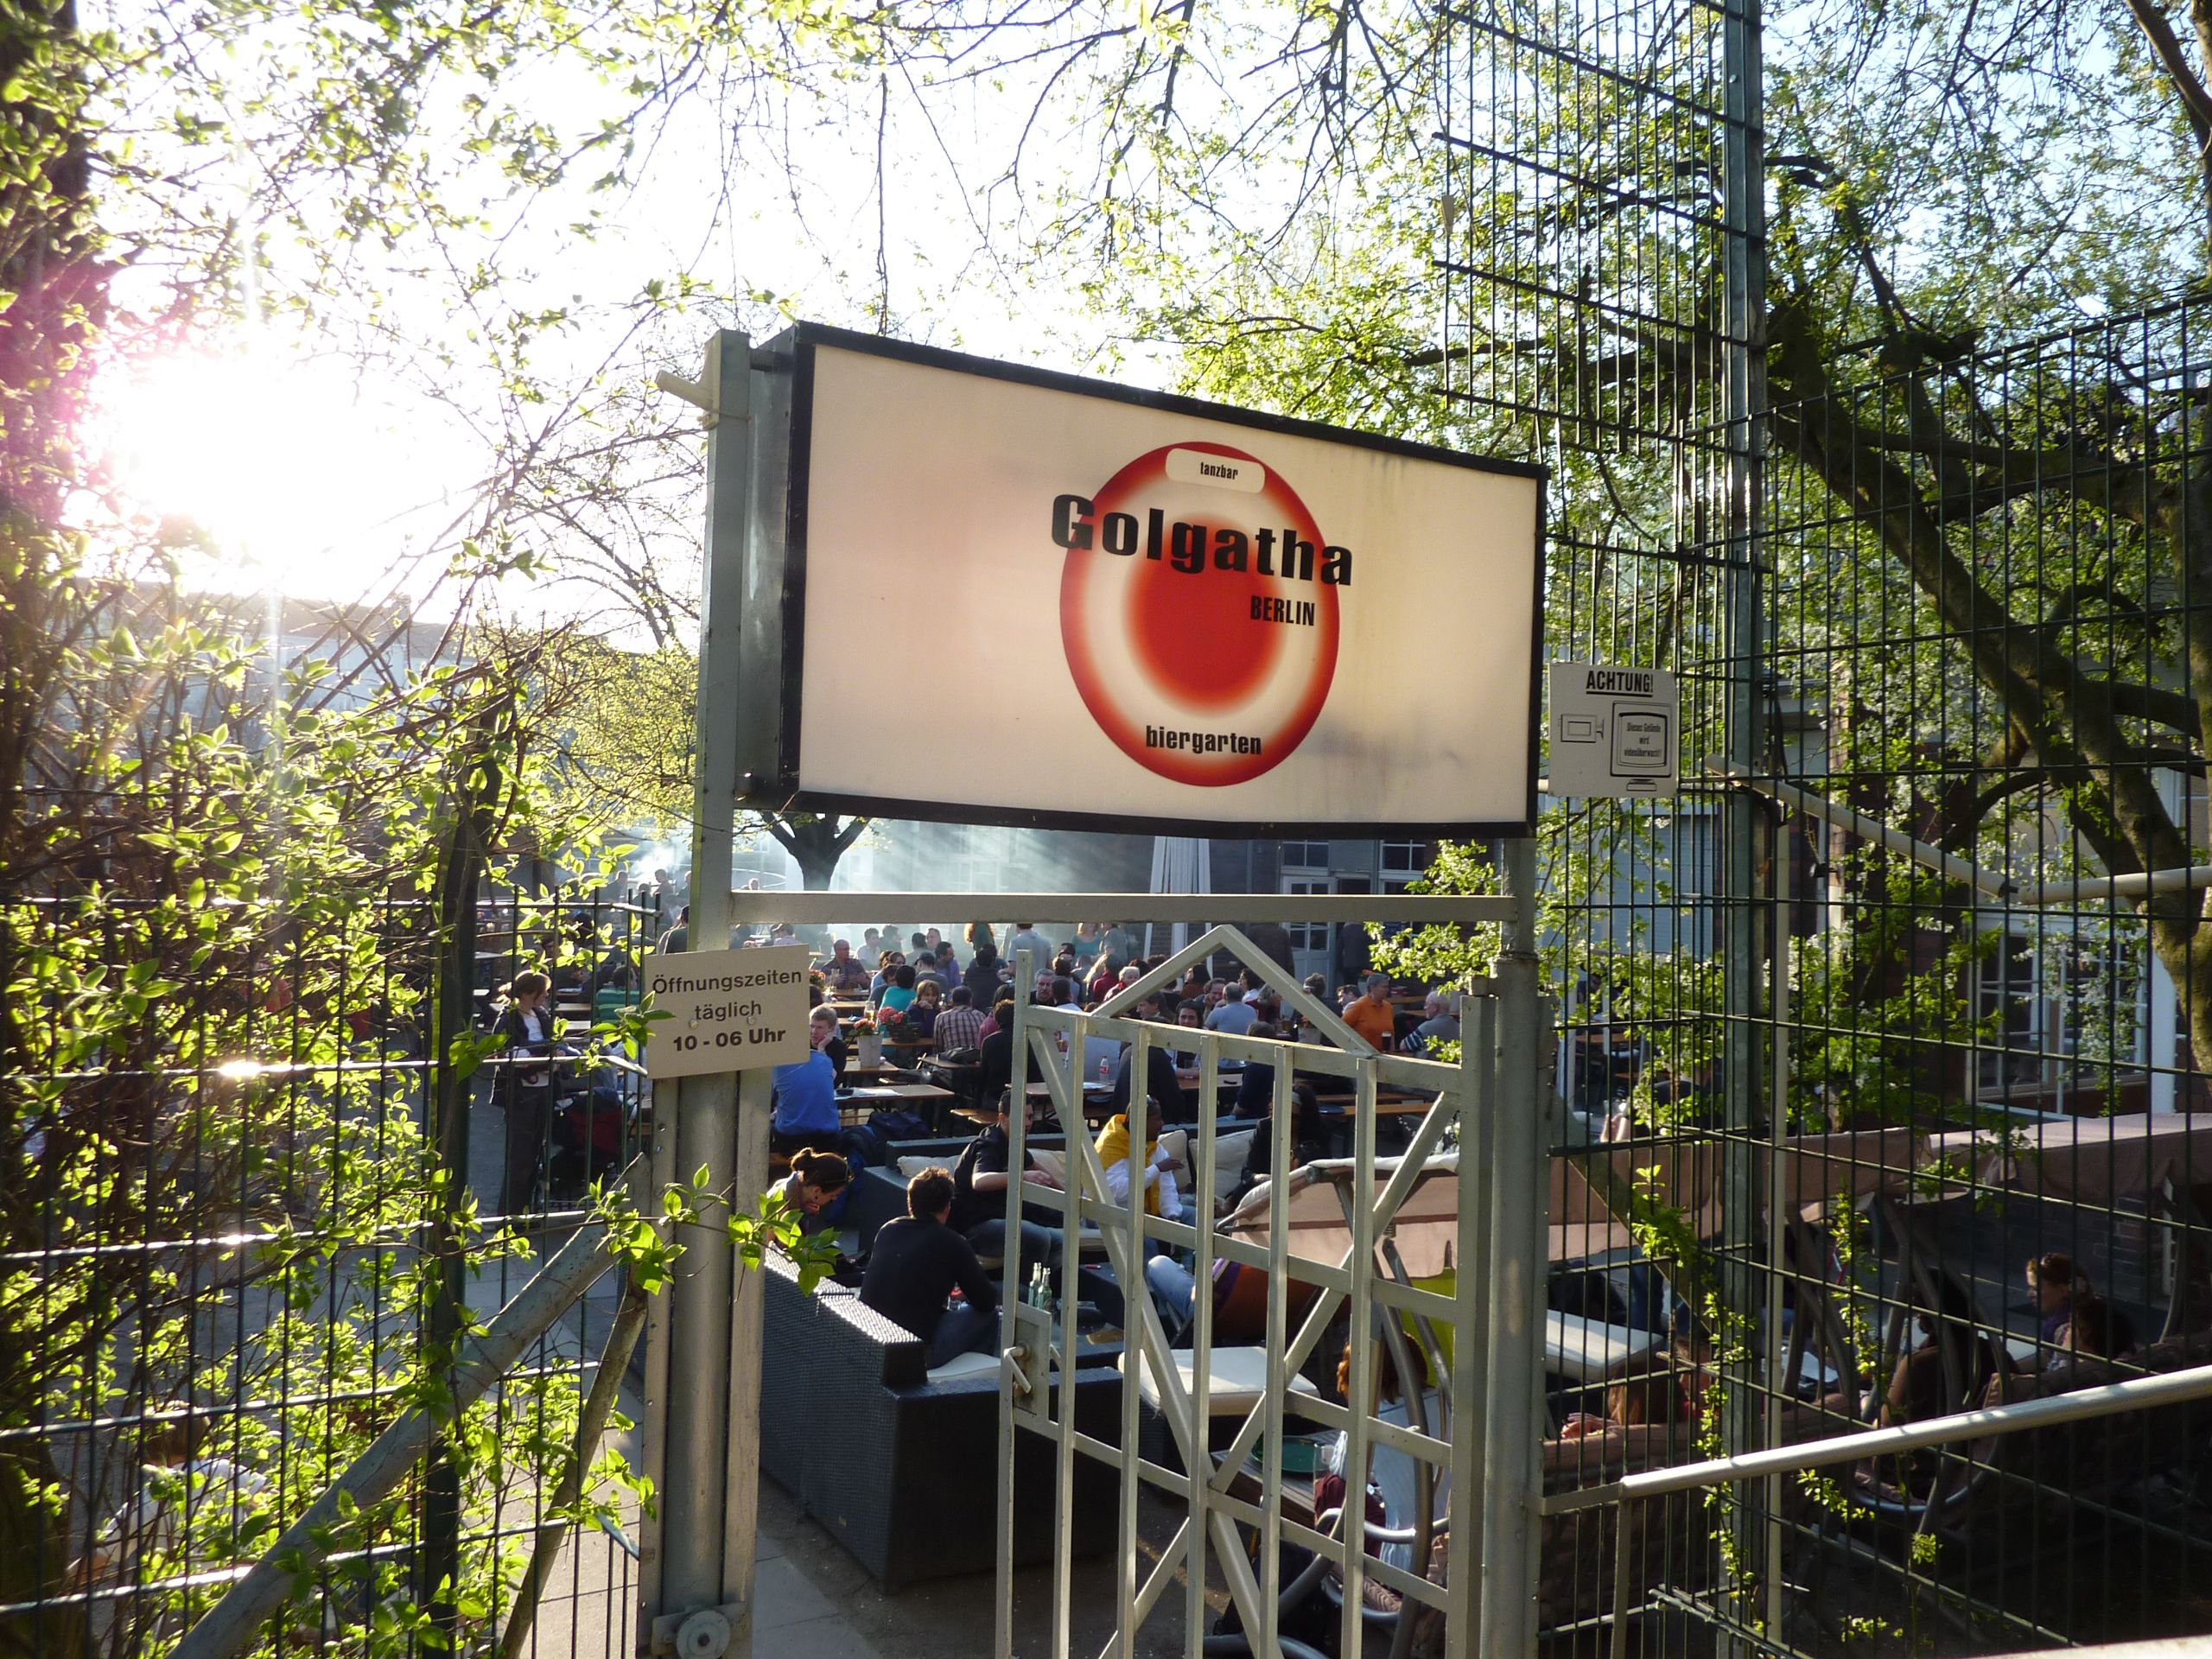 Biergarten Golgatha Berlin